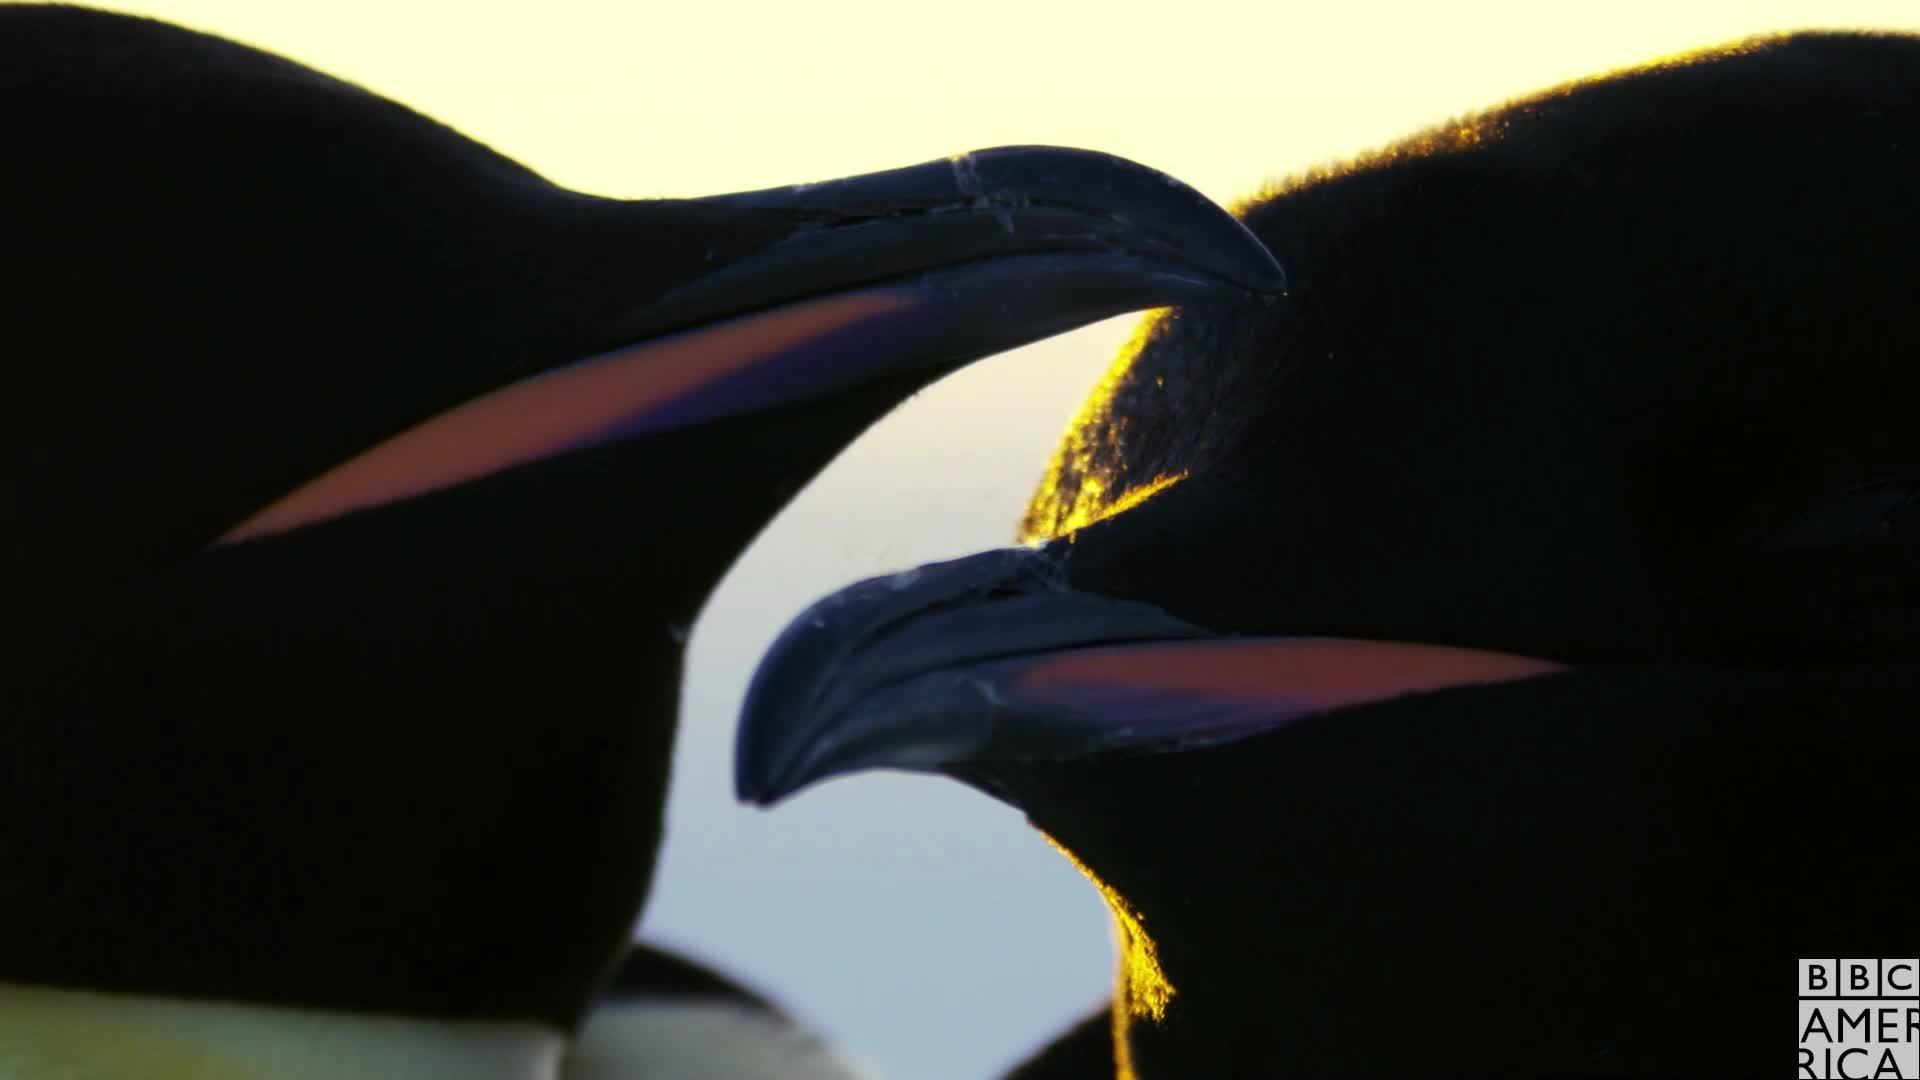 animal, animals, awww, bbc america, bbc america dynasties, bbc america: dynasties, dynasties, emperor penguin, emperor penguins, hug, hugs, love, penguin, penguins, Dynasties Penguin Cuddle GIFs